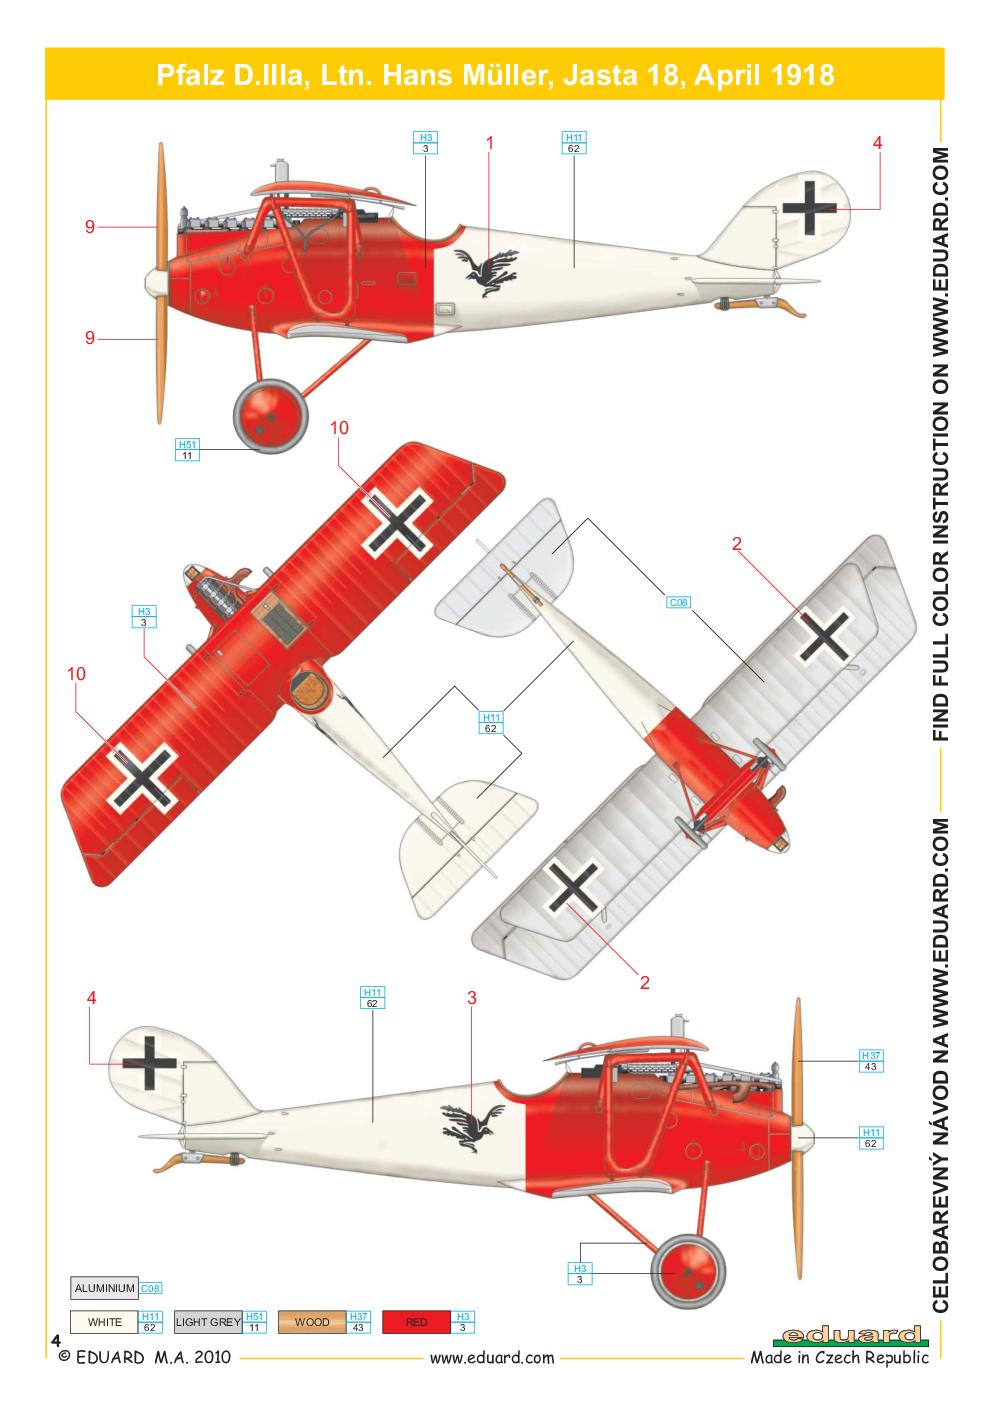 Eduard-8416-Pfalz-D.IIIa-WEEKEND-Bauanleitung-3 Pfalz D.IIIa in 1:48 von Eduard als WEEKEND-Edition #8414